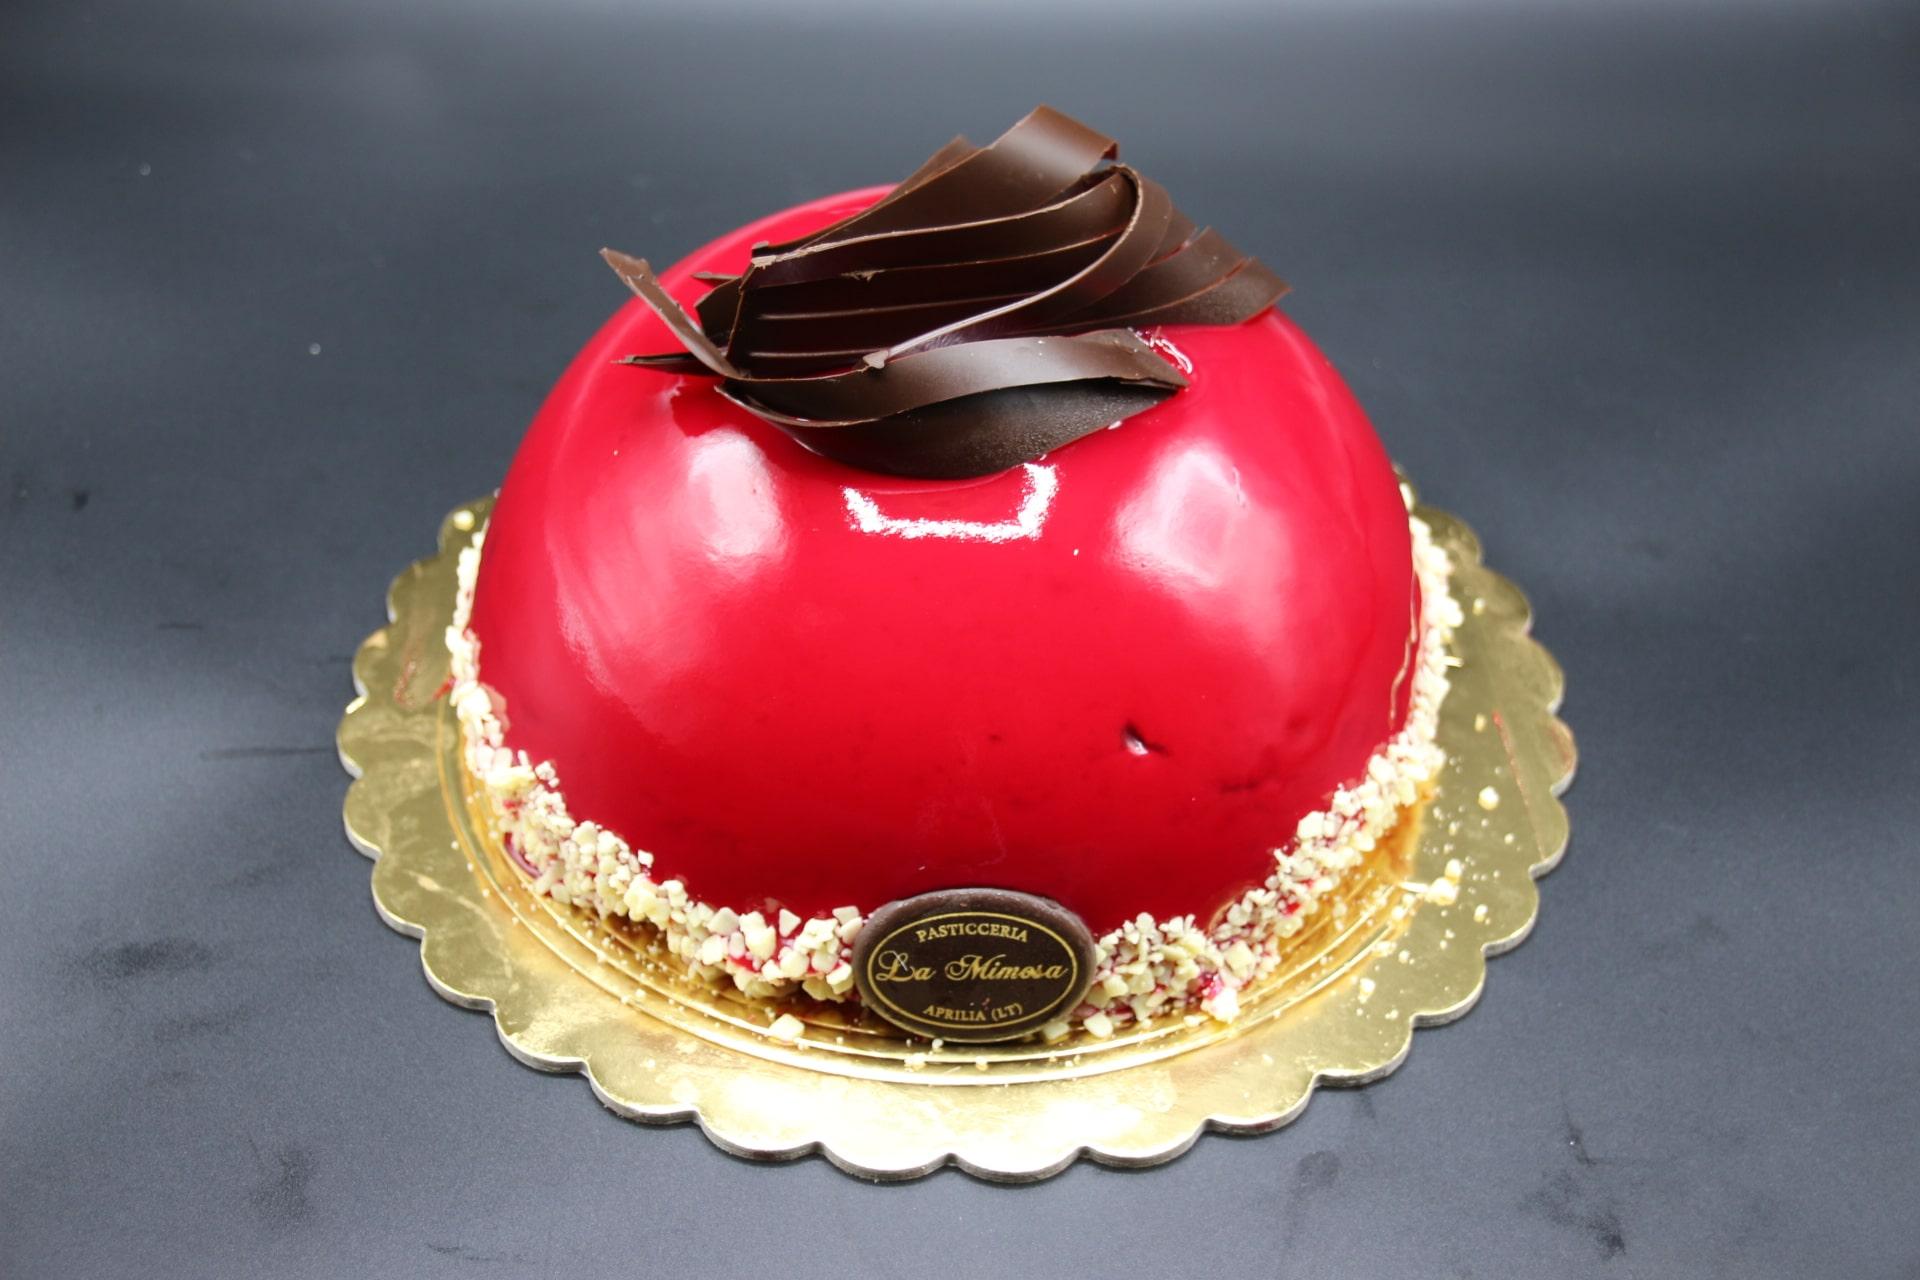 Cheesecake Lampone